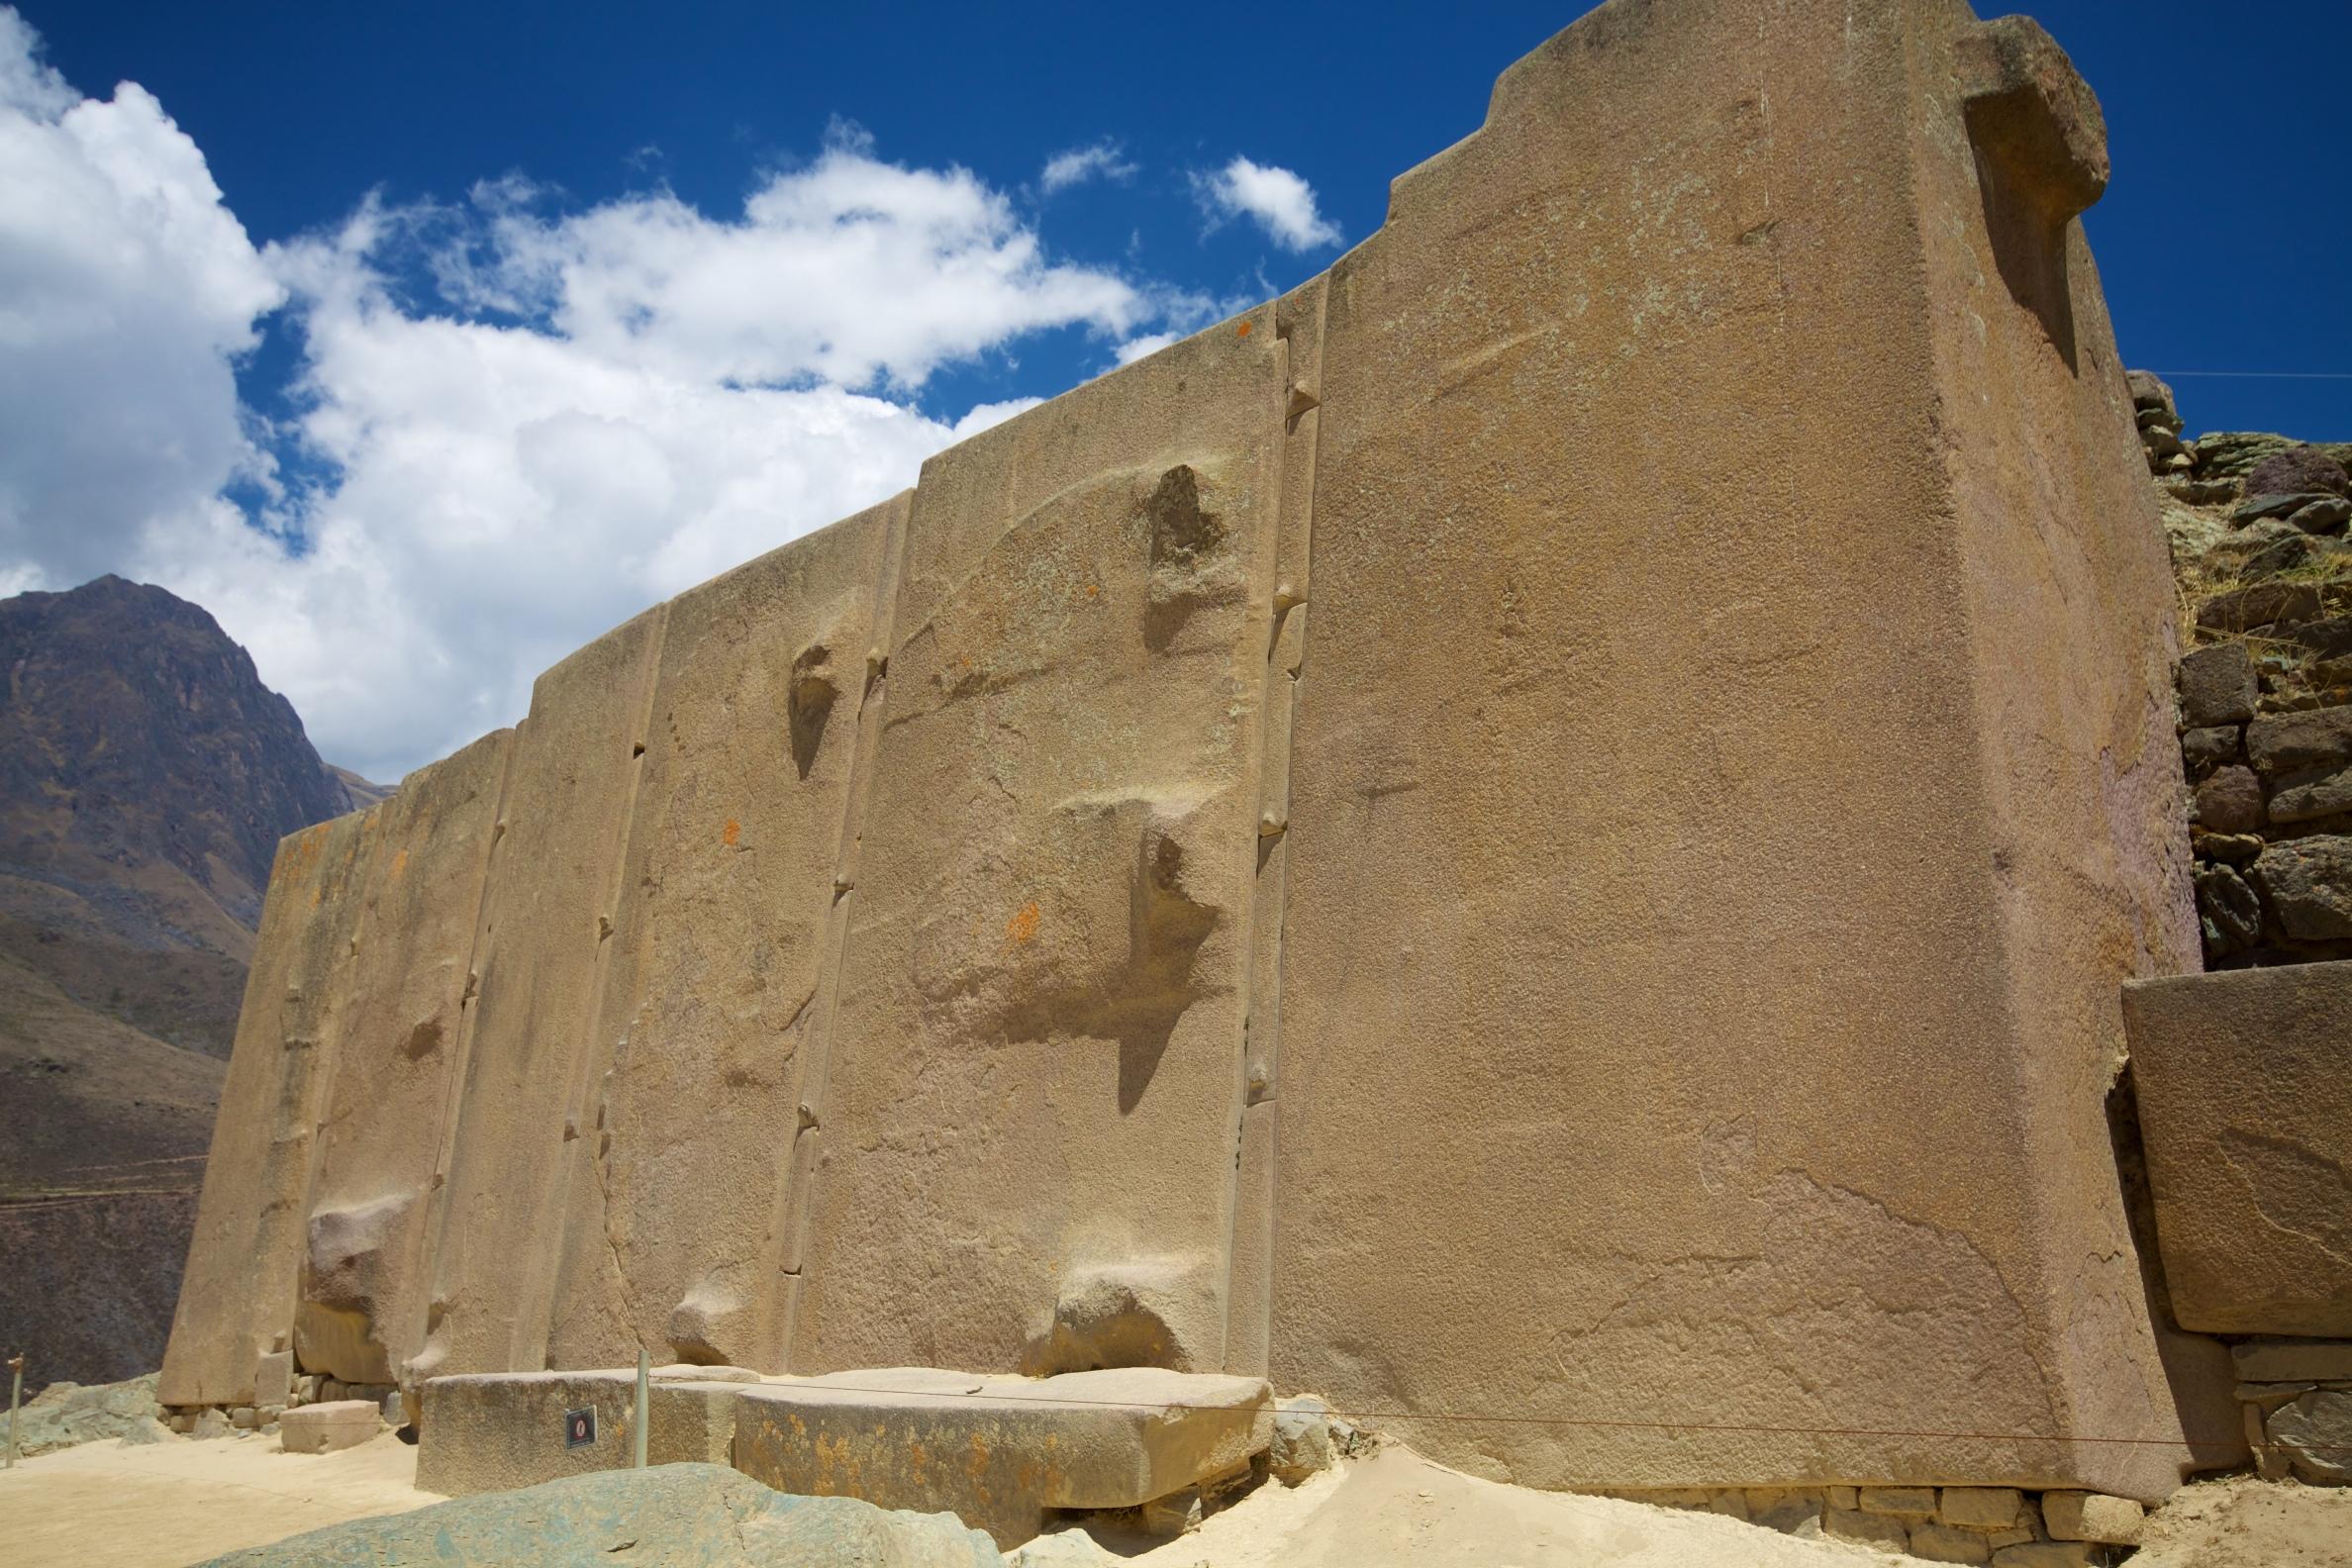 Wall of Six Monoliths in Ollantaytambo, Peru